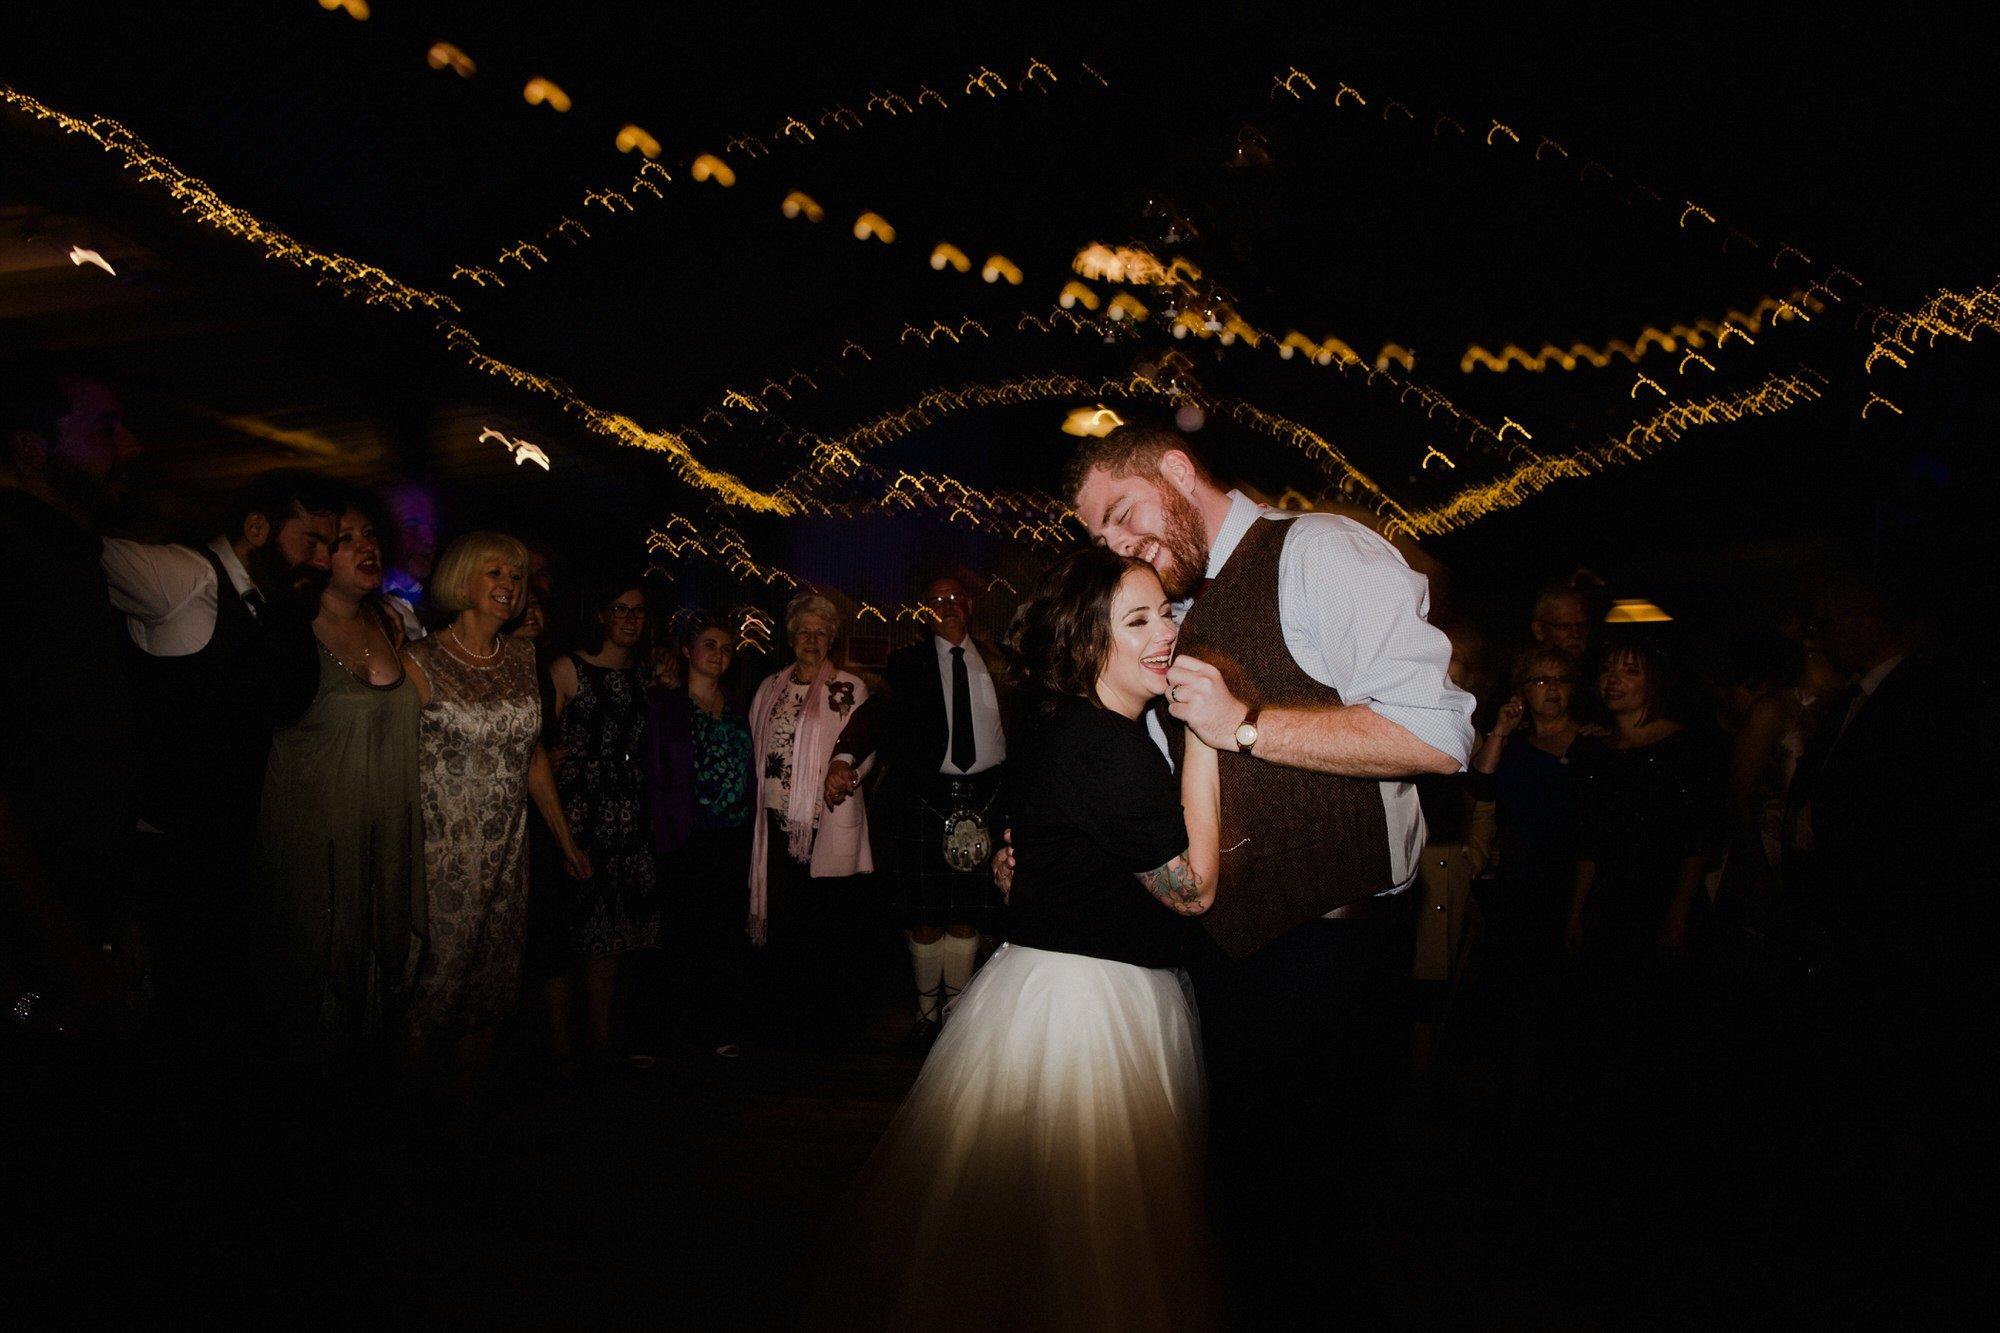 088 TIN SHED KNOCKRAICH FARM WEDDING ALTERNATIVE BRIDE ZOE ALEXANDRA PHOTOGRAPHY